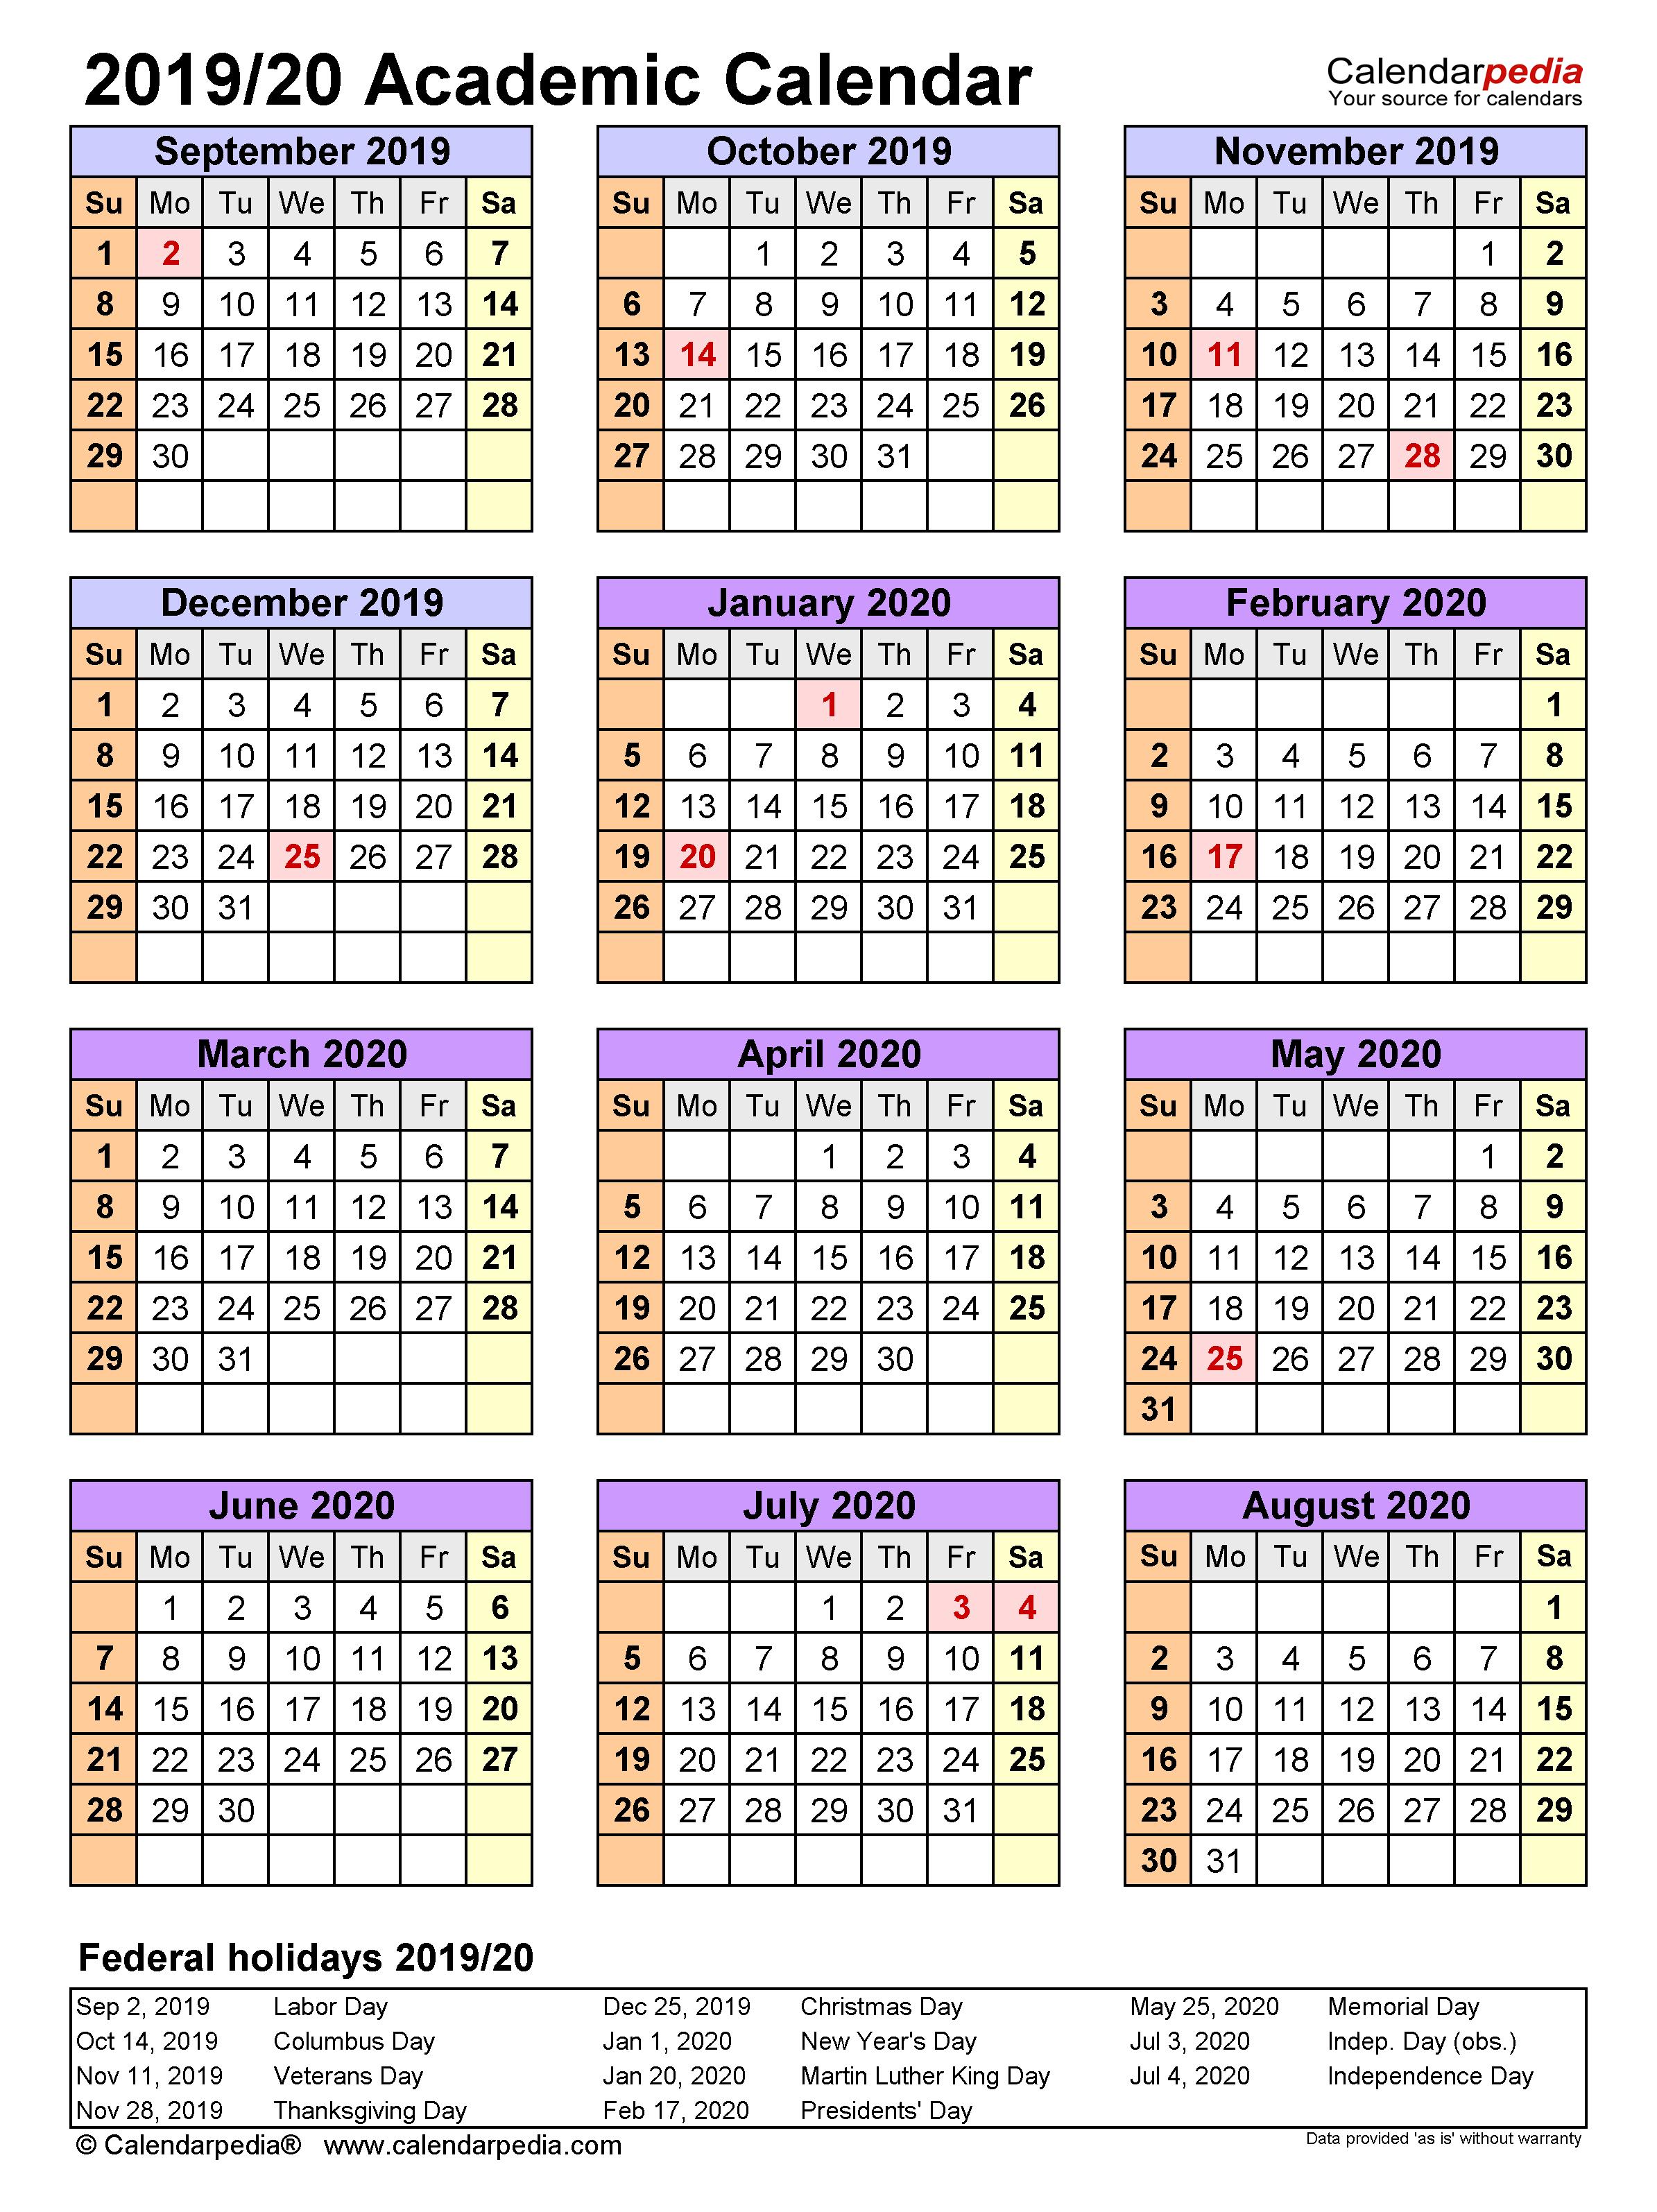 Iowa State University Spring Semester Printable Calendar Inside Angelo State Printable Academic Calendar